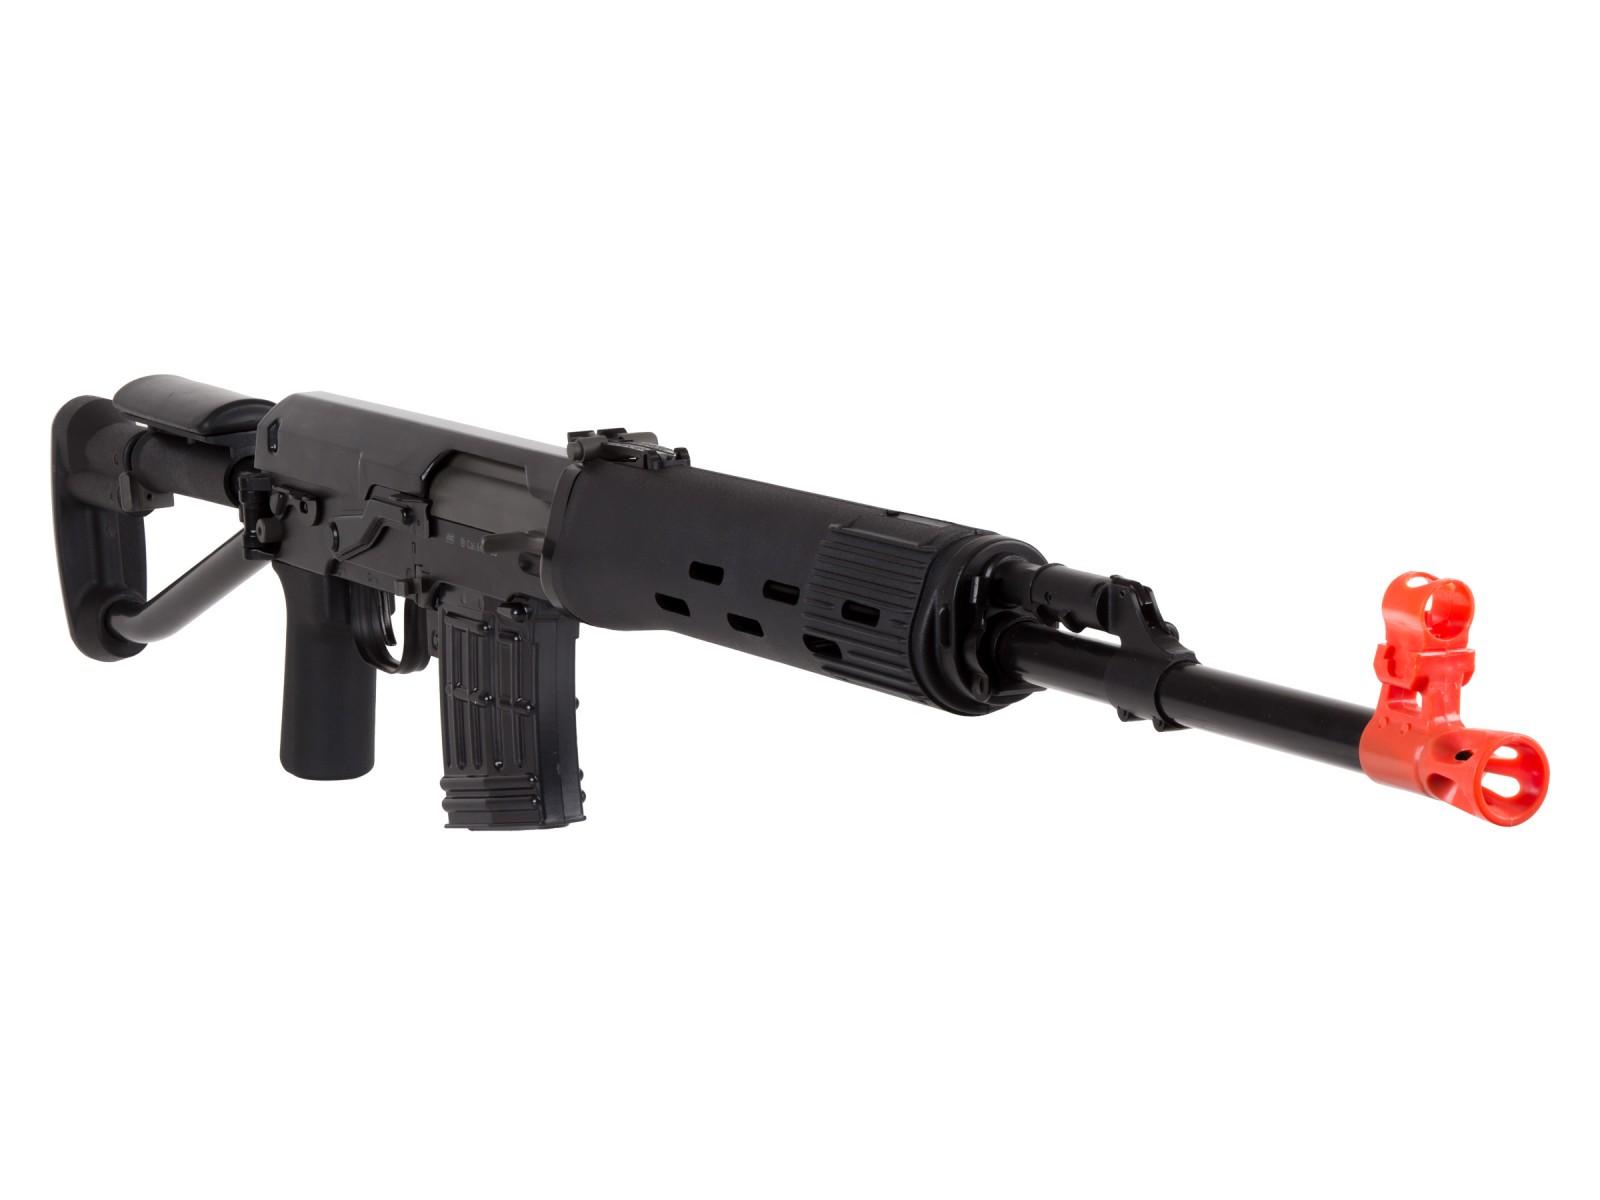 ASG Dragunov Sniper Spring SVD-S Airsoft Rifle. Airsoft guns